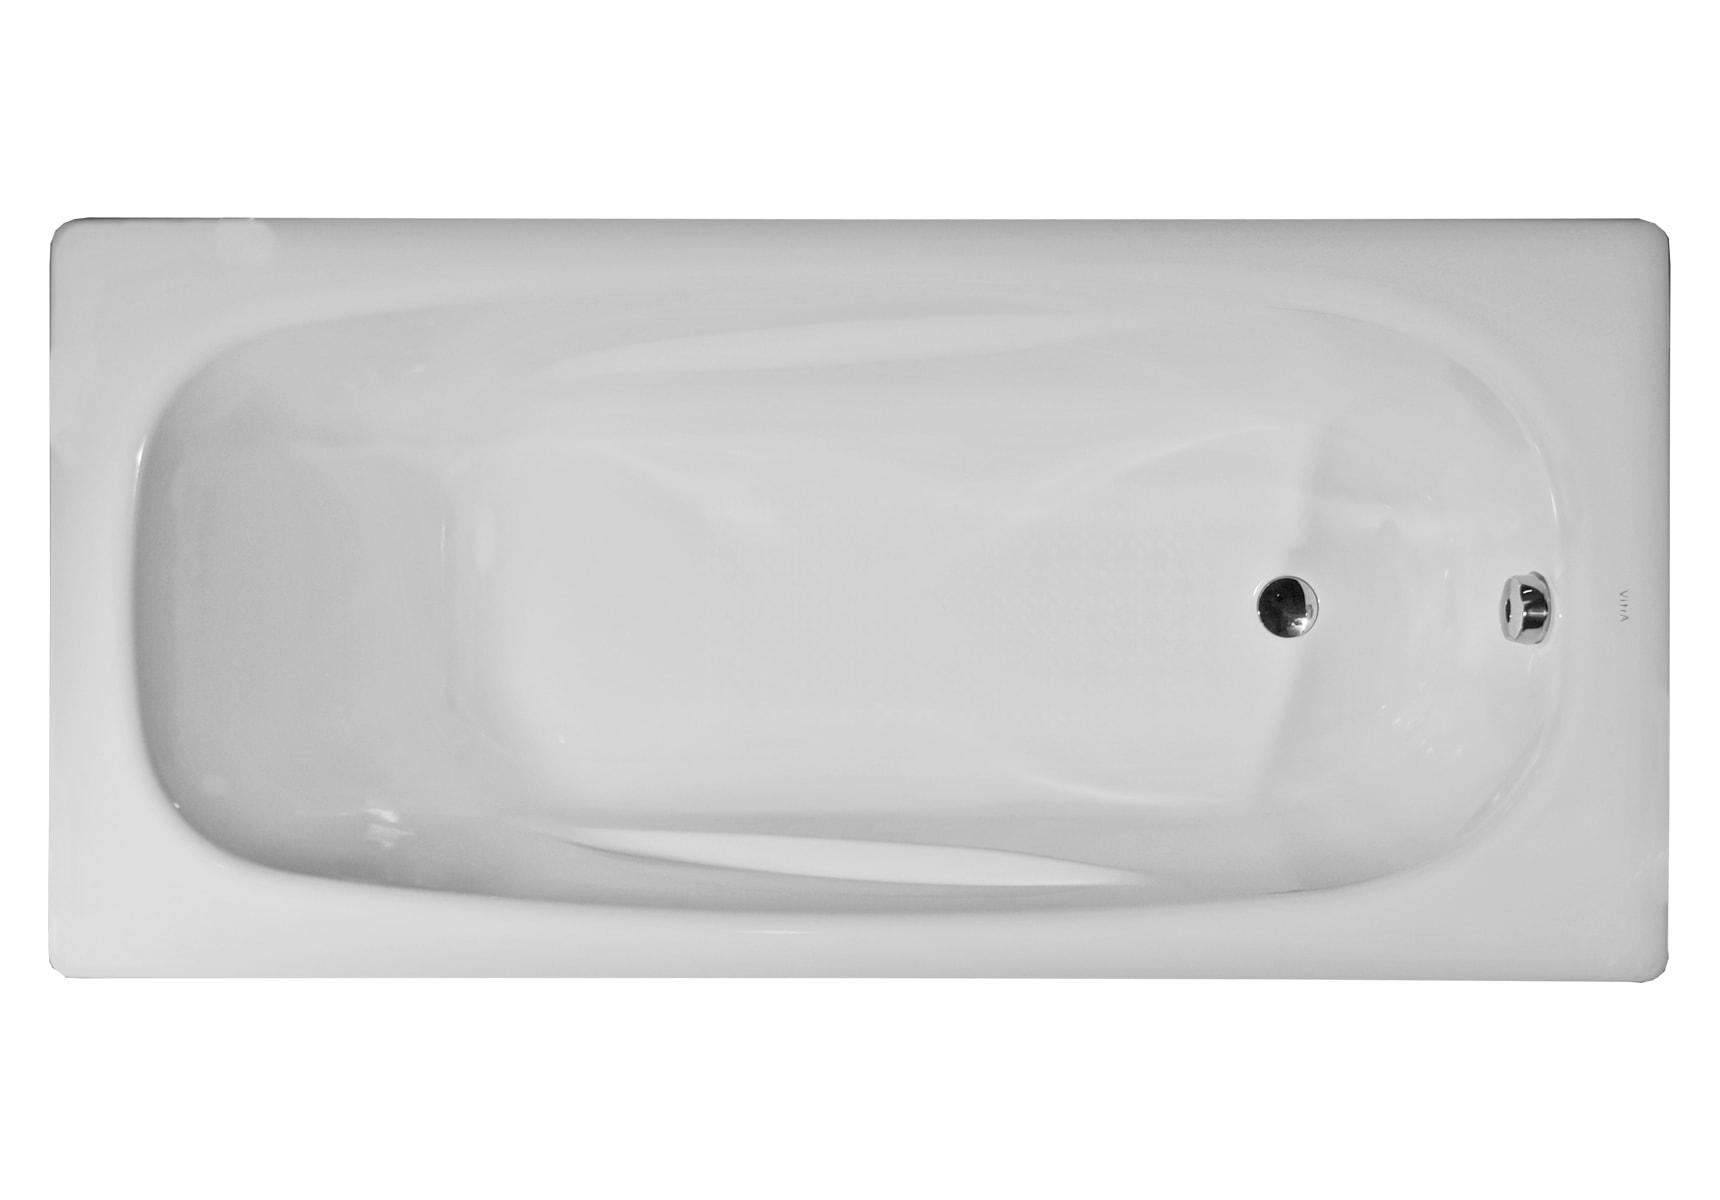 Generic Ergo 150x75cm Steel Bathtub, 3.5mm, Sound Proofing Pad